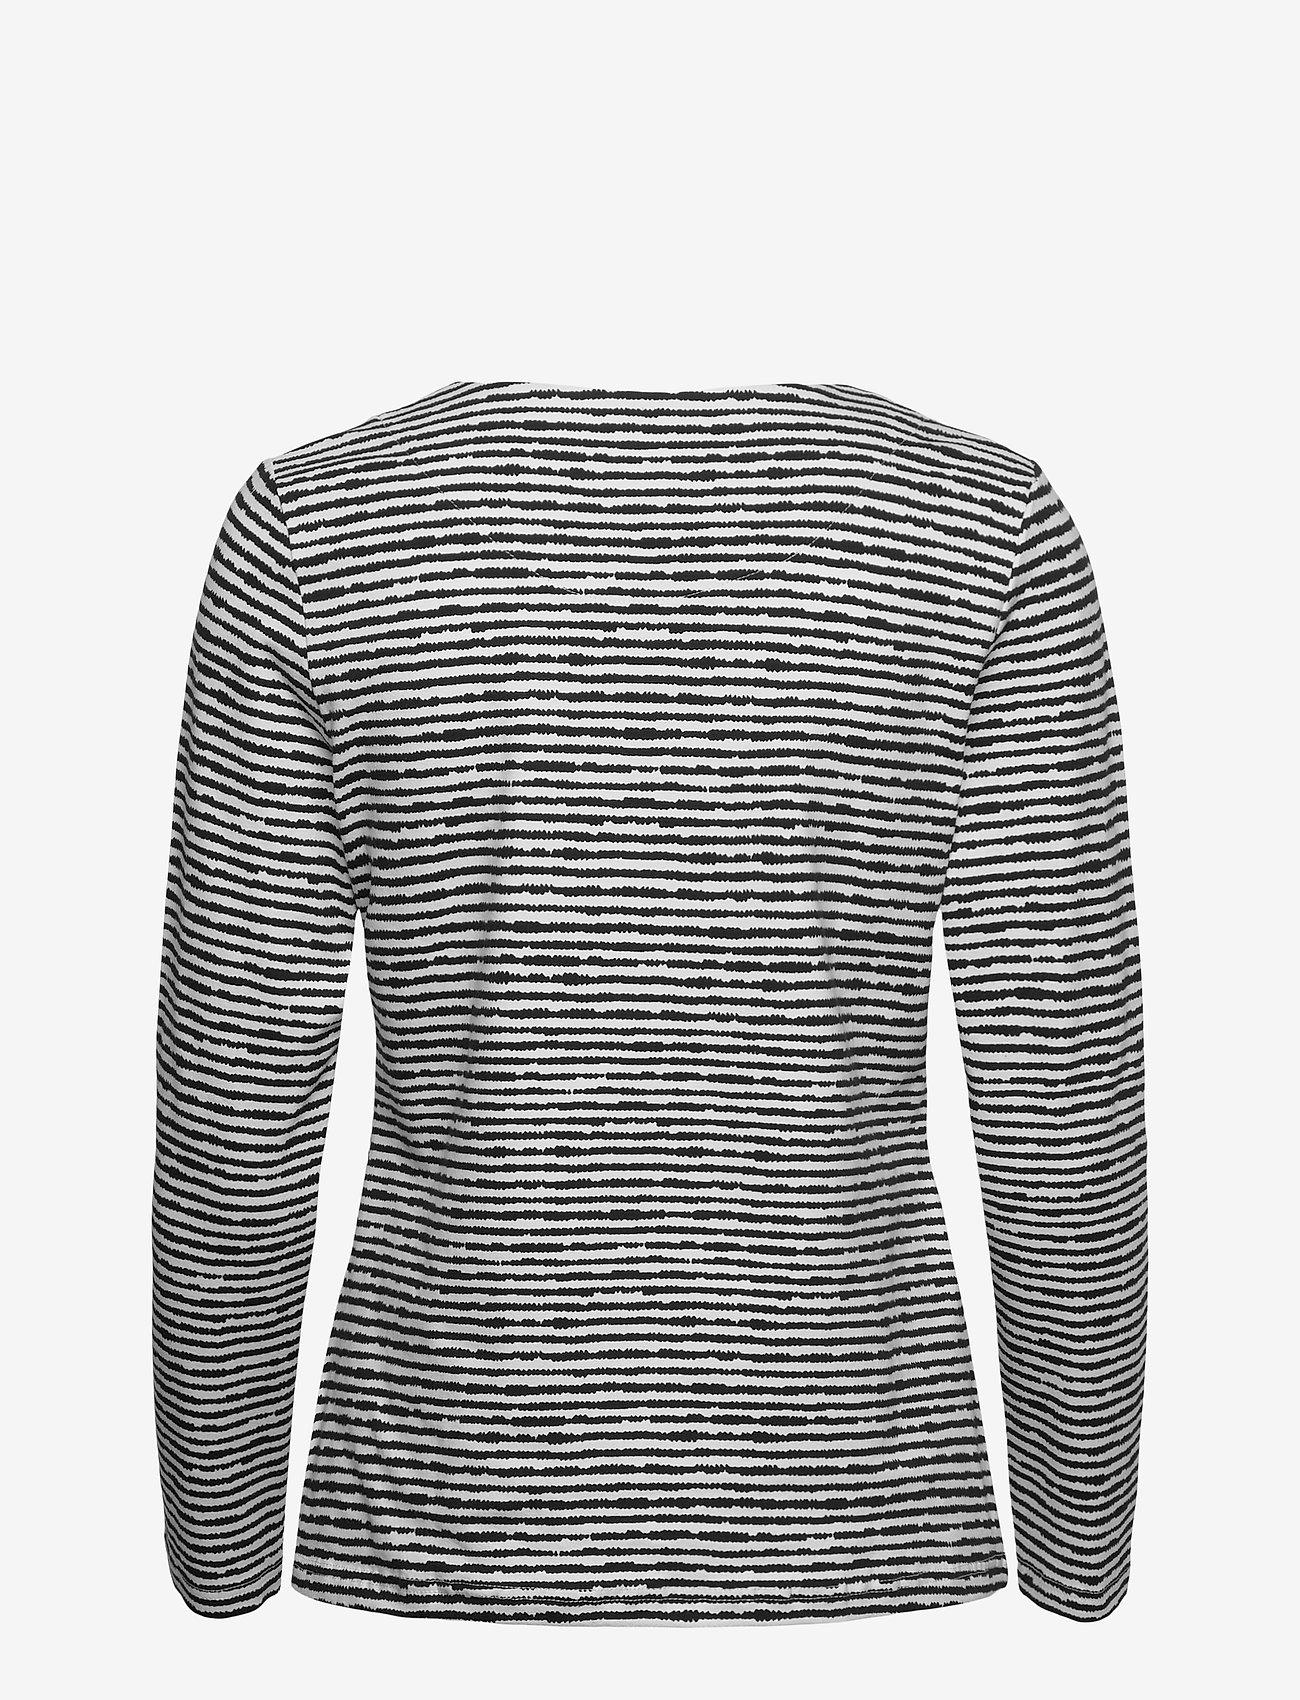 Nanso - Ladies blouse, Aprilli - tops met lange mouwen - black and white - 1